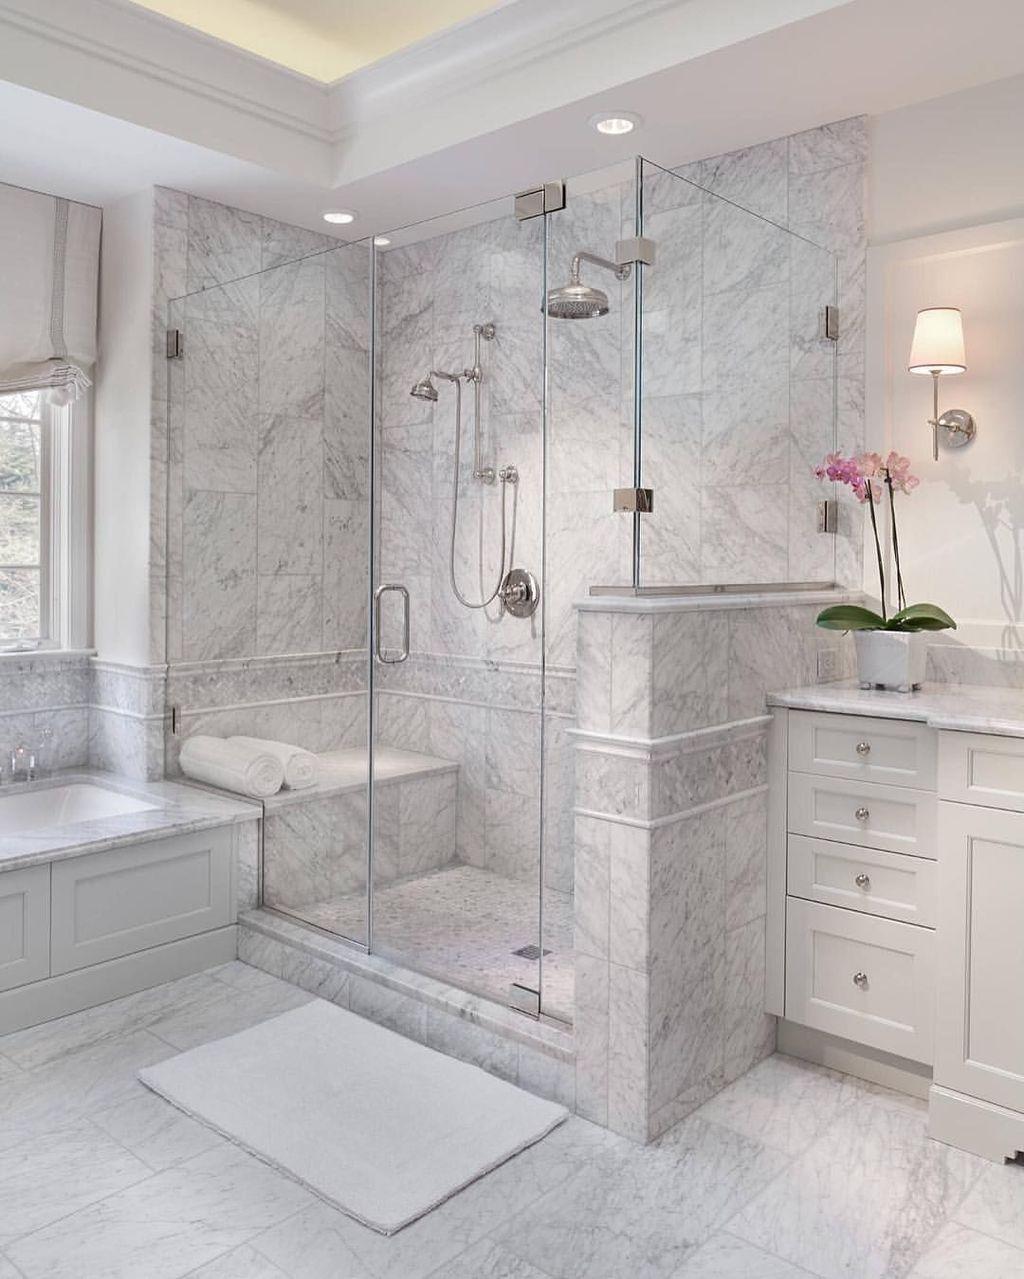 Awesome 46 Beautiful Master Bathroom Remodel Design Ideas